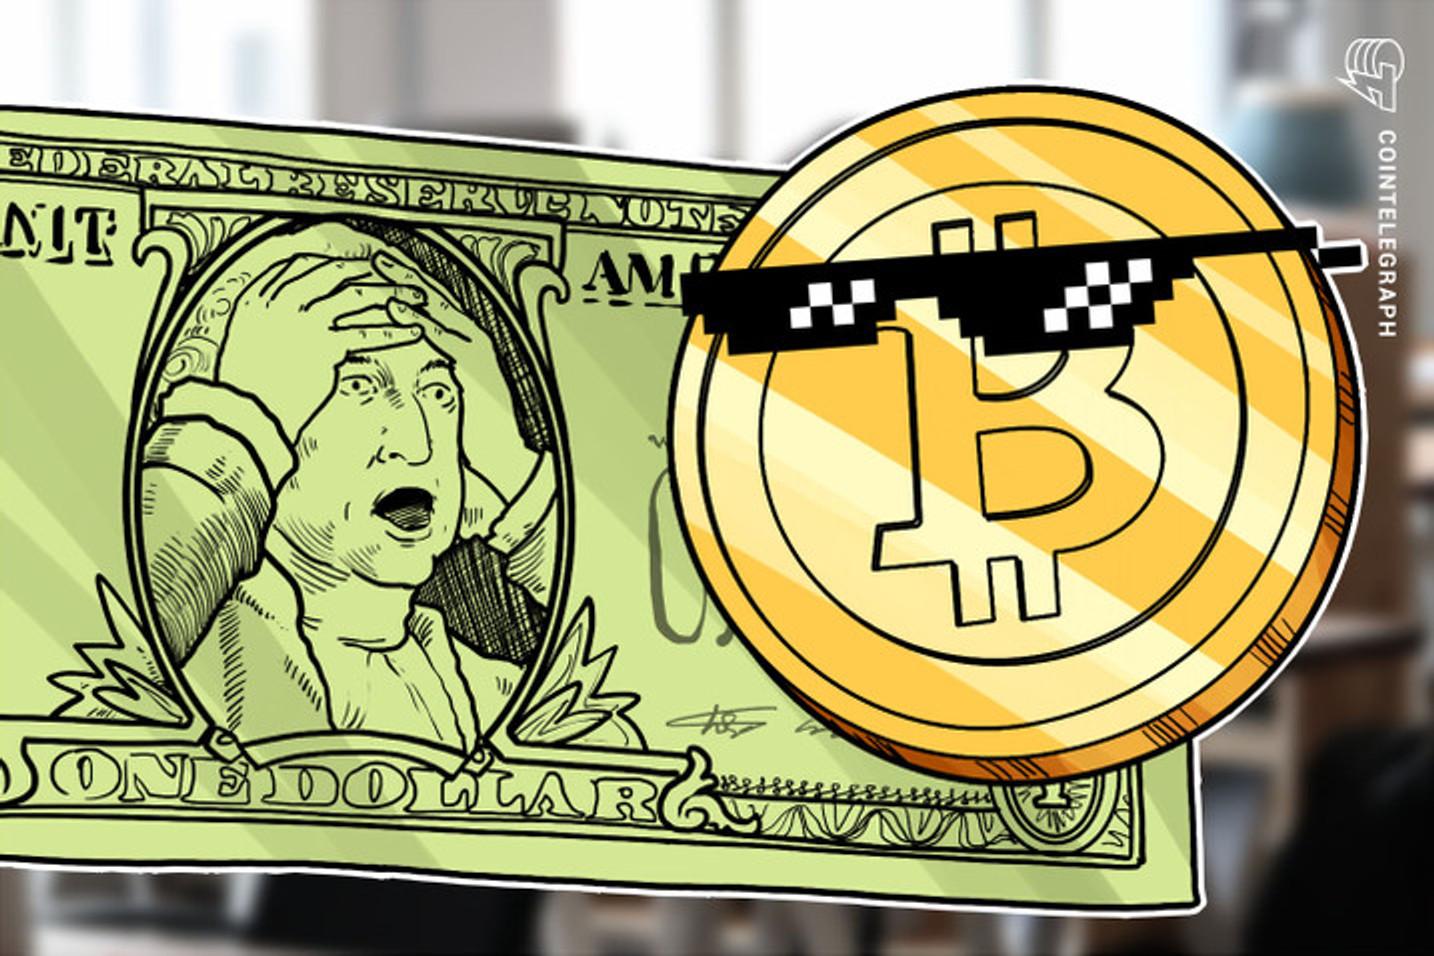 JPMorgan prevê Bitcoin a R$ 780 mil no longo prazo